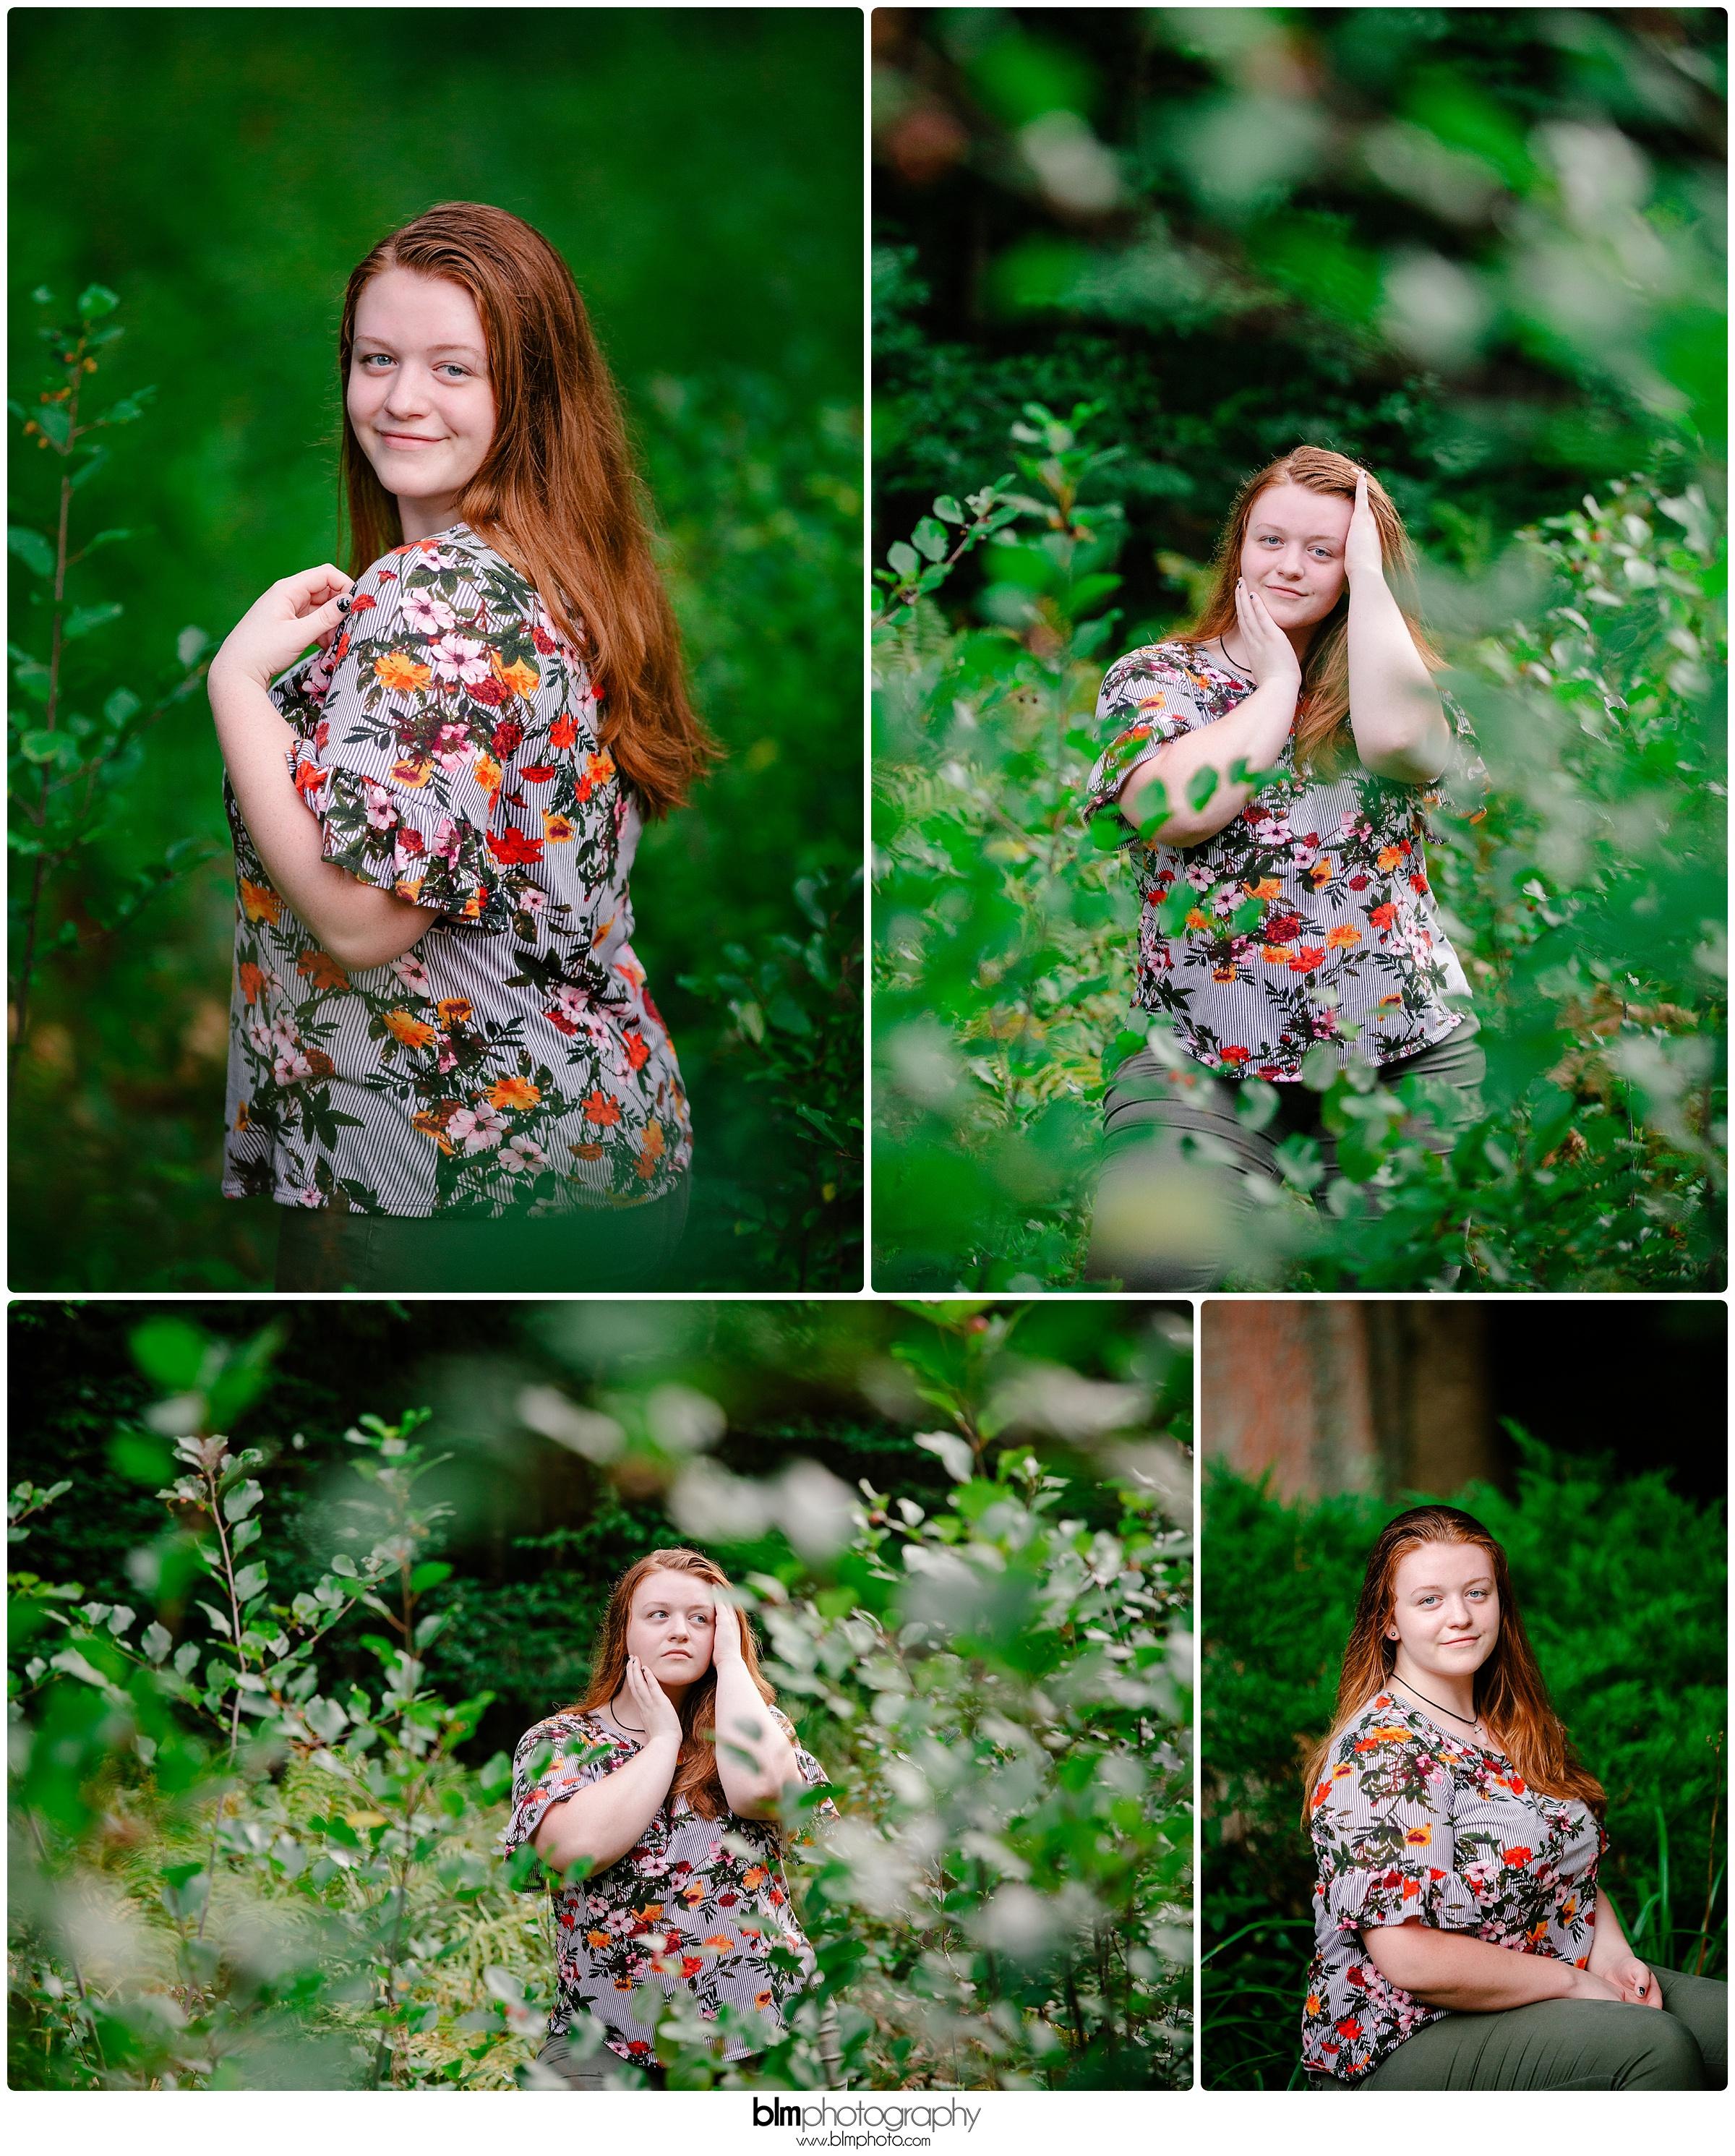 Alison Worcester,Alison-Worcester_Senior-Portraits,BLM,Brianna Morrissey,Brie Morrissey,High School Senior,On Location Portrait,Outdoor Portrait,Photo,Photographer,Photography,Senior Photos,Senior Portraits,redhead,www.blmphoto.com/contact,©BLM Photography 2018,